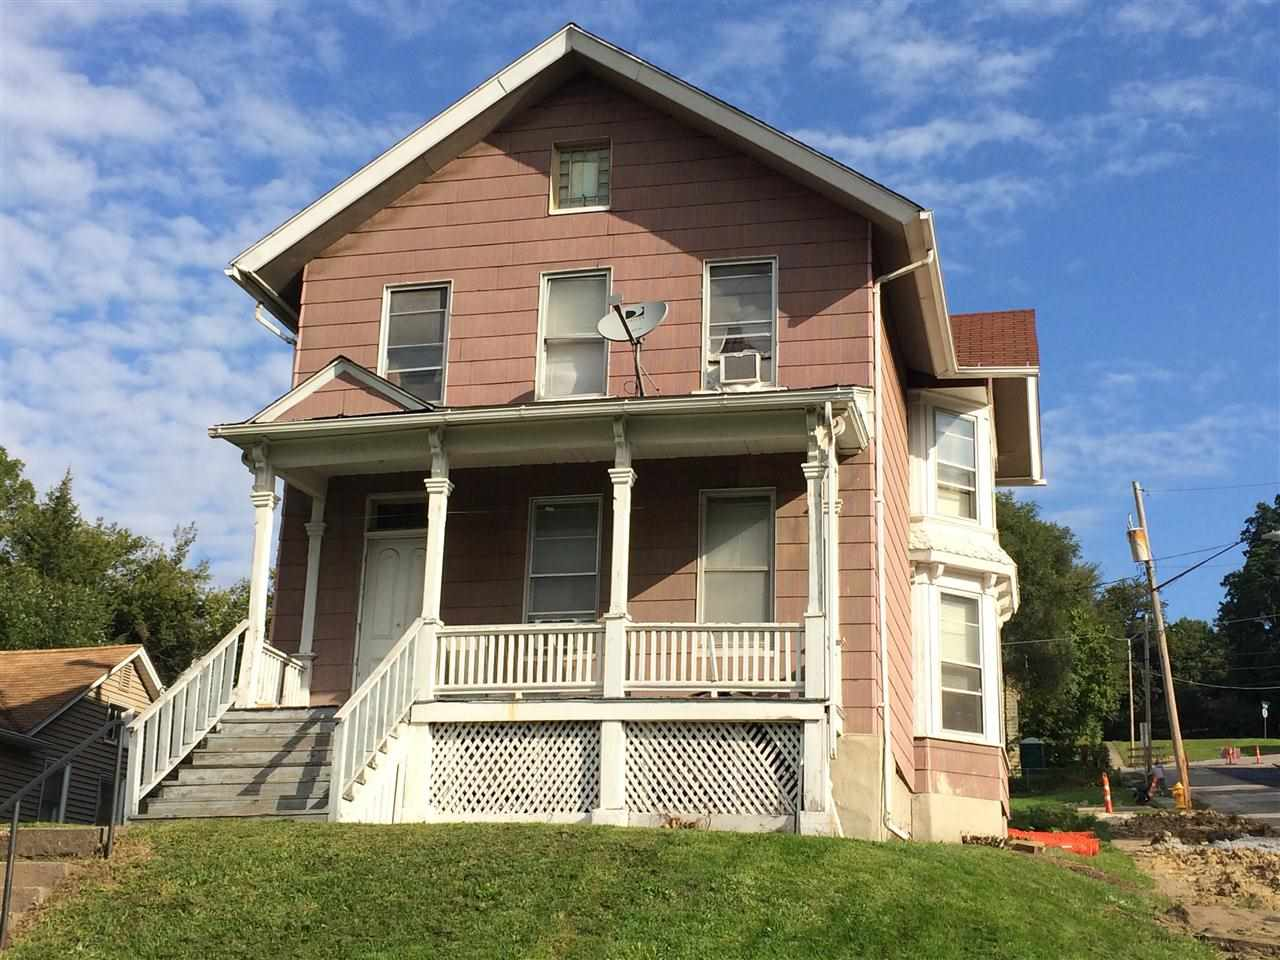 Real Estate for Sale, ListingId: 29952271, Davenport,IA52804